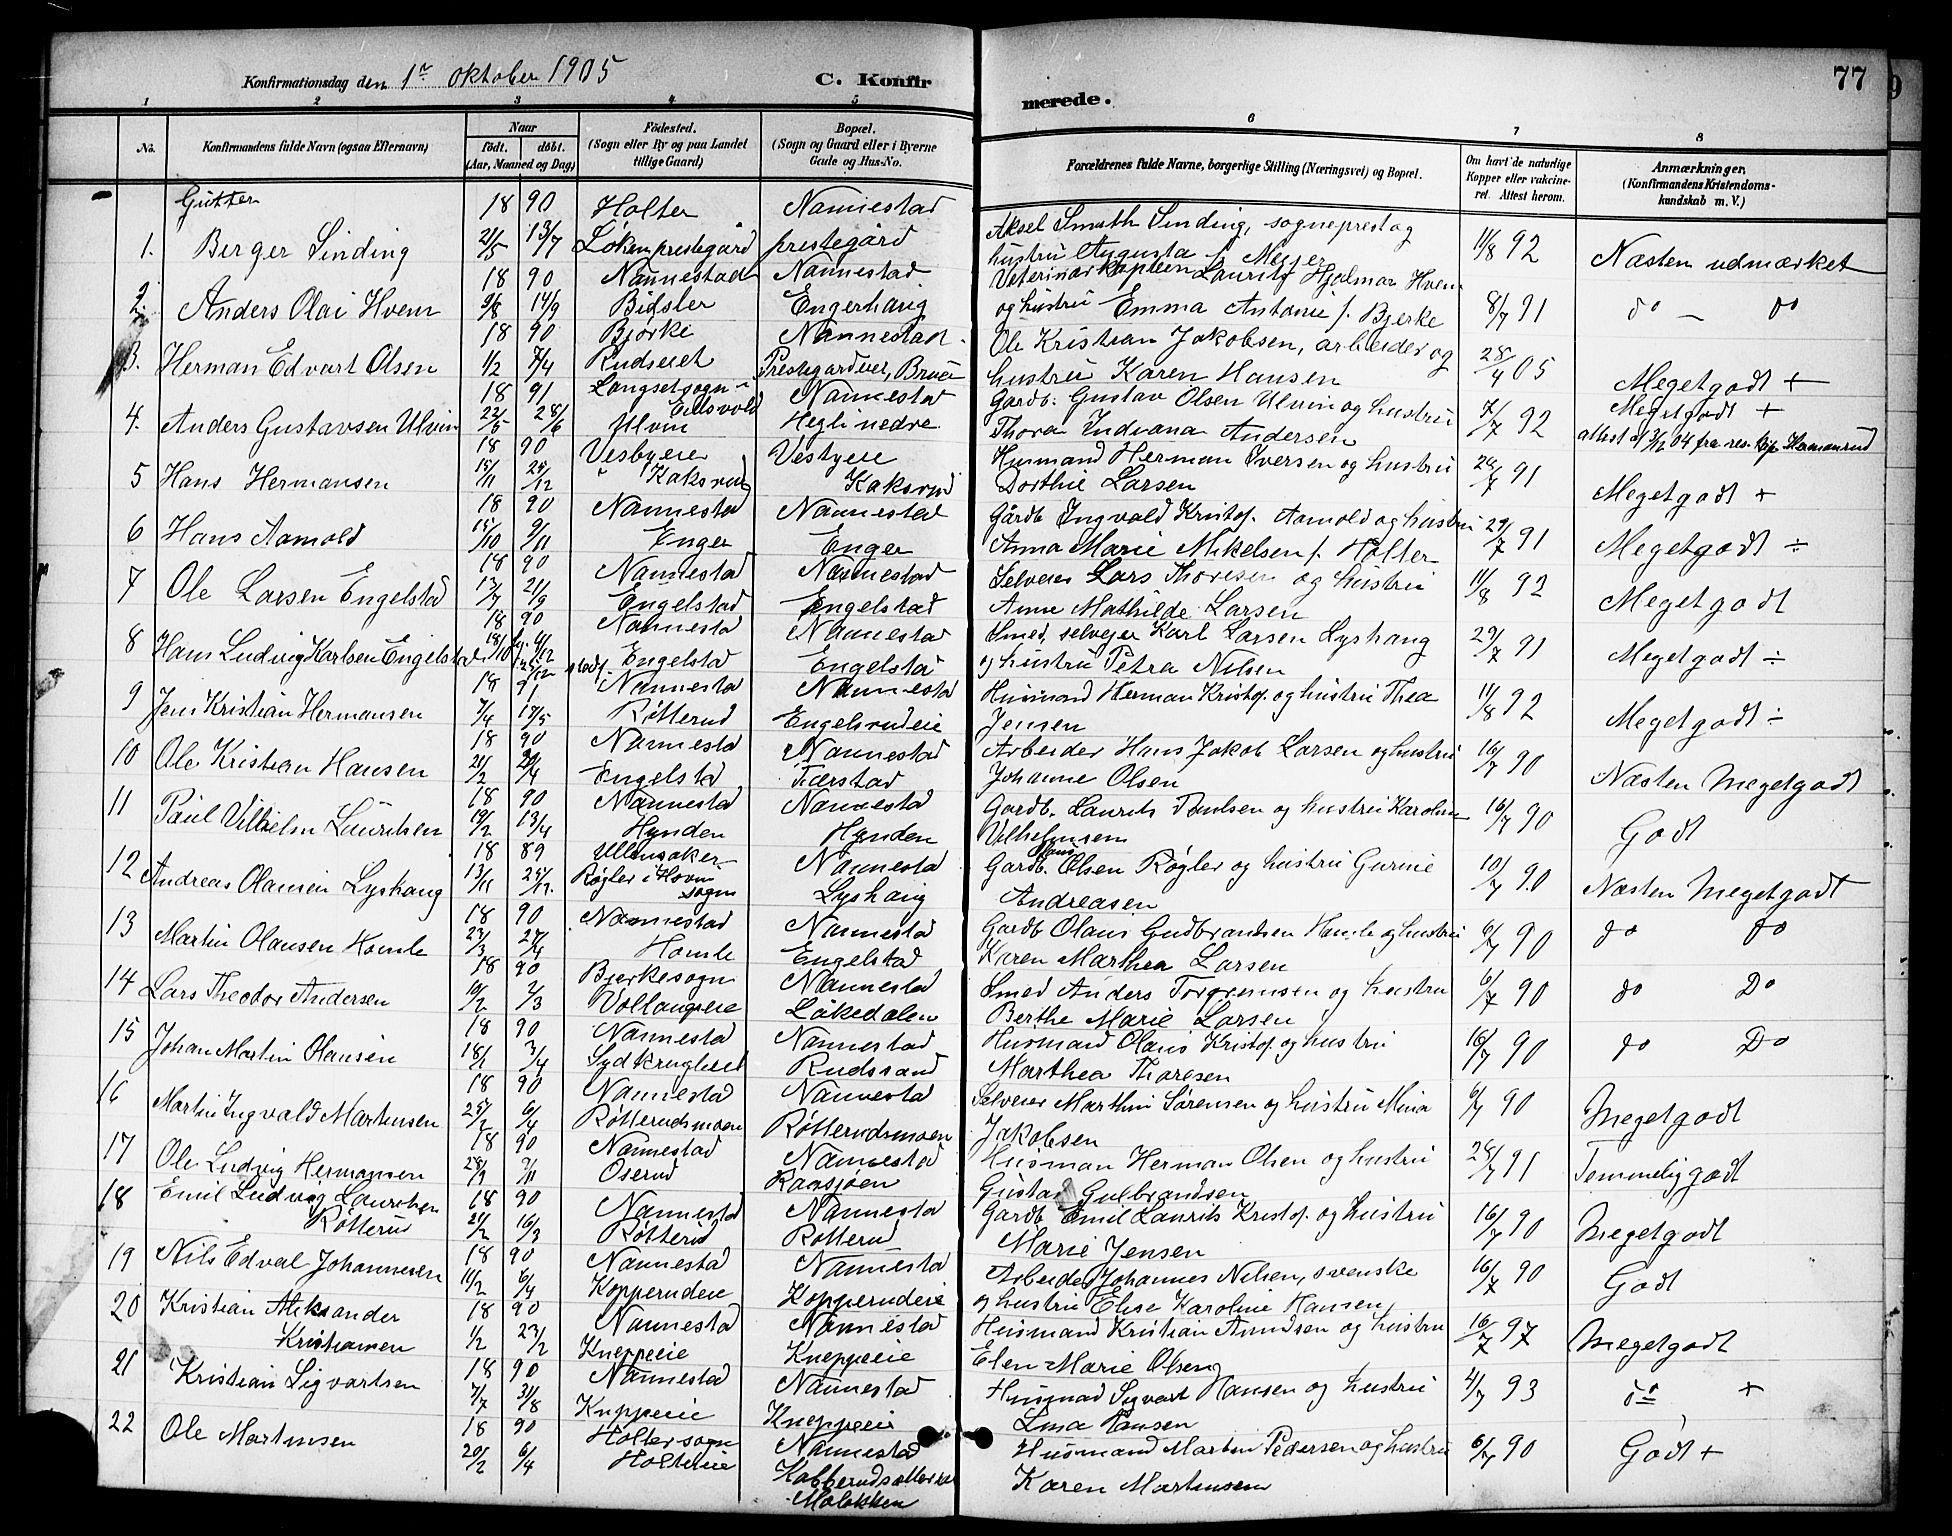 SAO, Nannestad prestekontor Kirkebøker, G/Ga/L0002: Klokkerbok nr. I 2, 1901-1913, s. 77